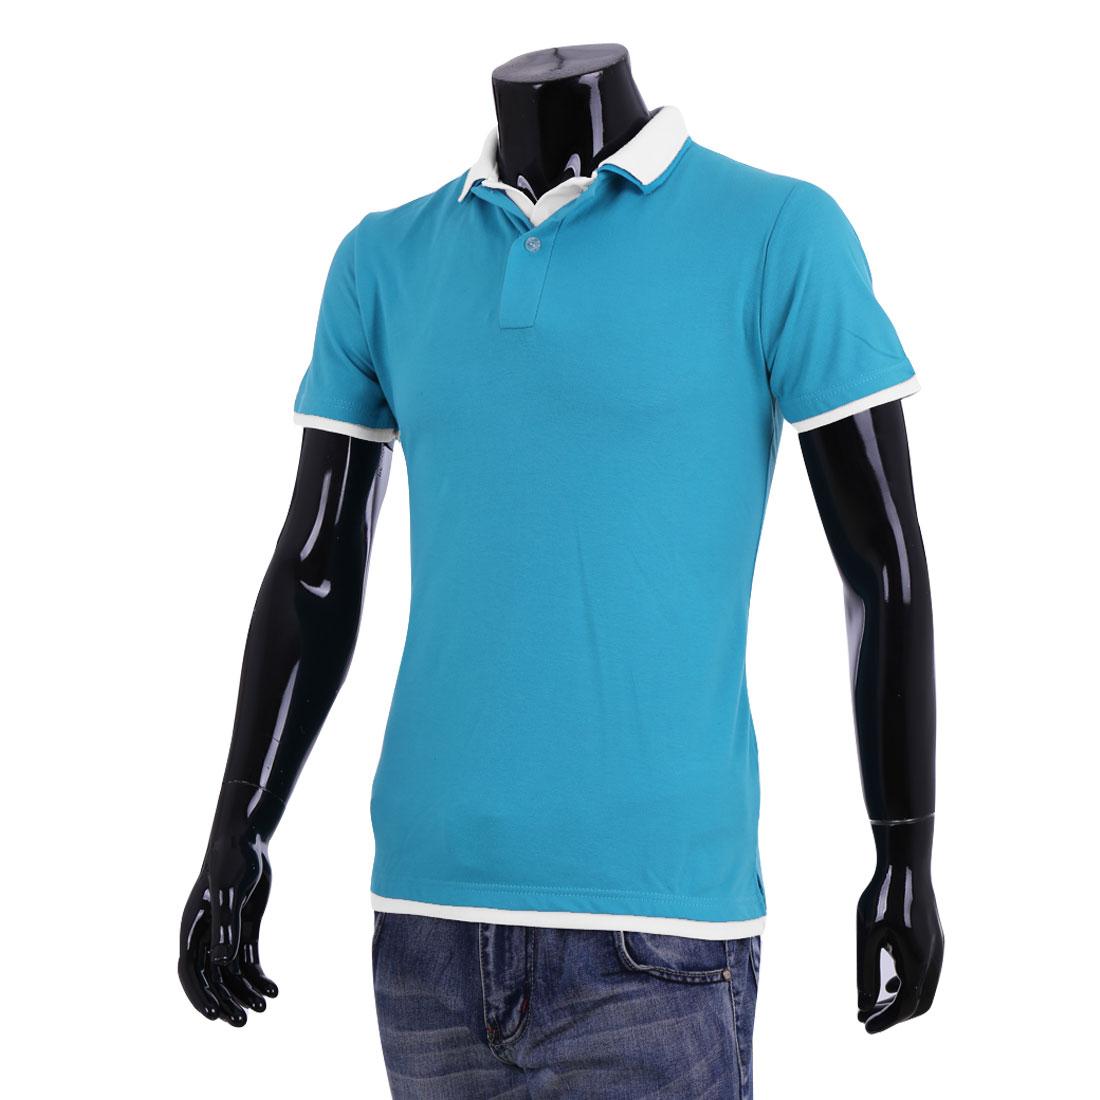 Men Cyan White Point Collar Button Closure Short Sleeves Polo Shirt XXL